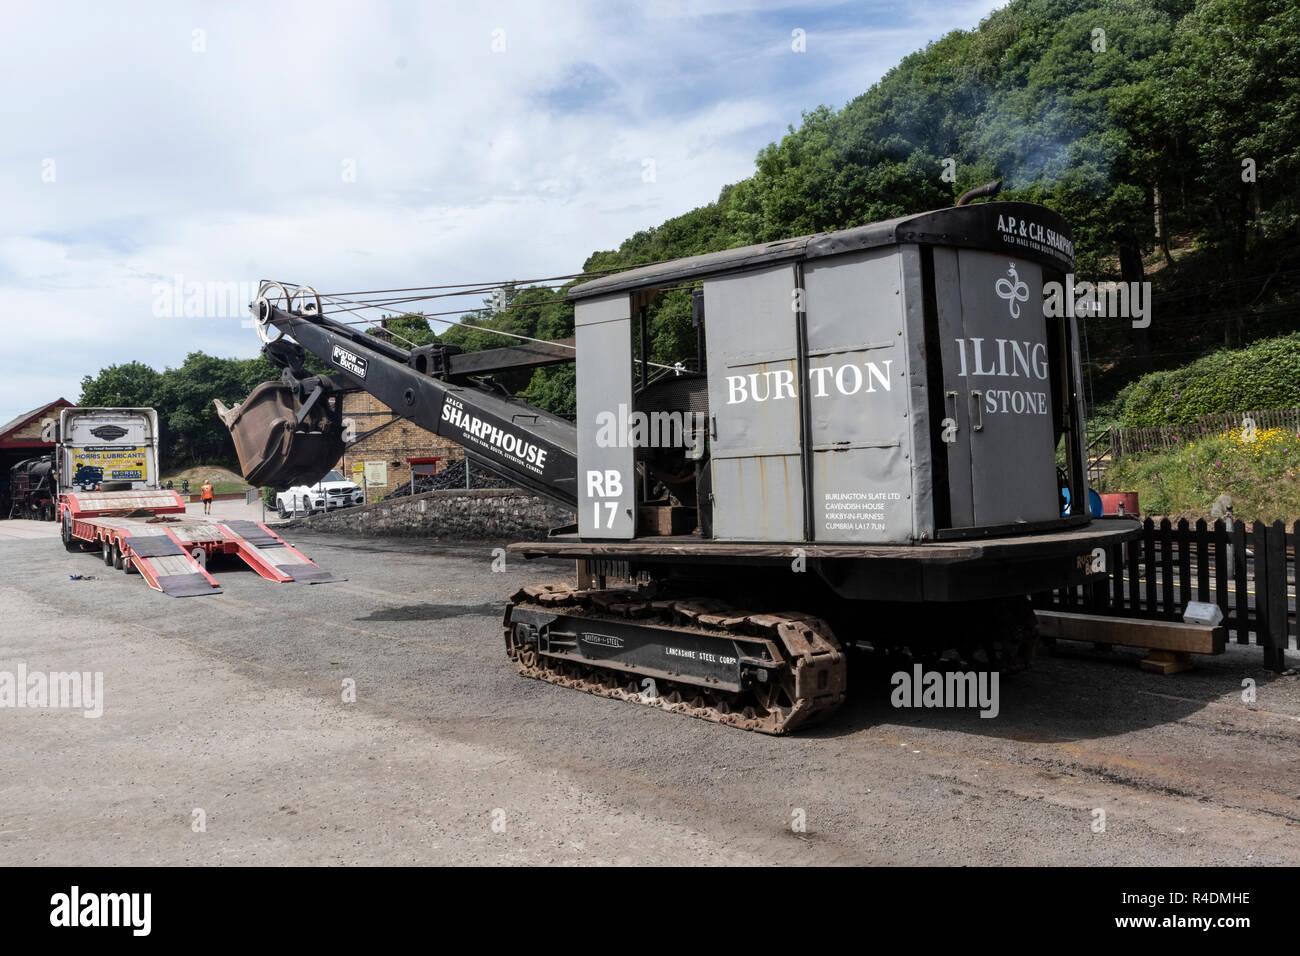 Ruston & Bucyrus caterpillar digger at Lakeside and Haverthwaite Steam Railway, Nr Ulverston, Cumbria, English Lake District, UK - Stock Image